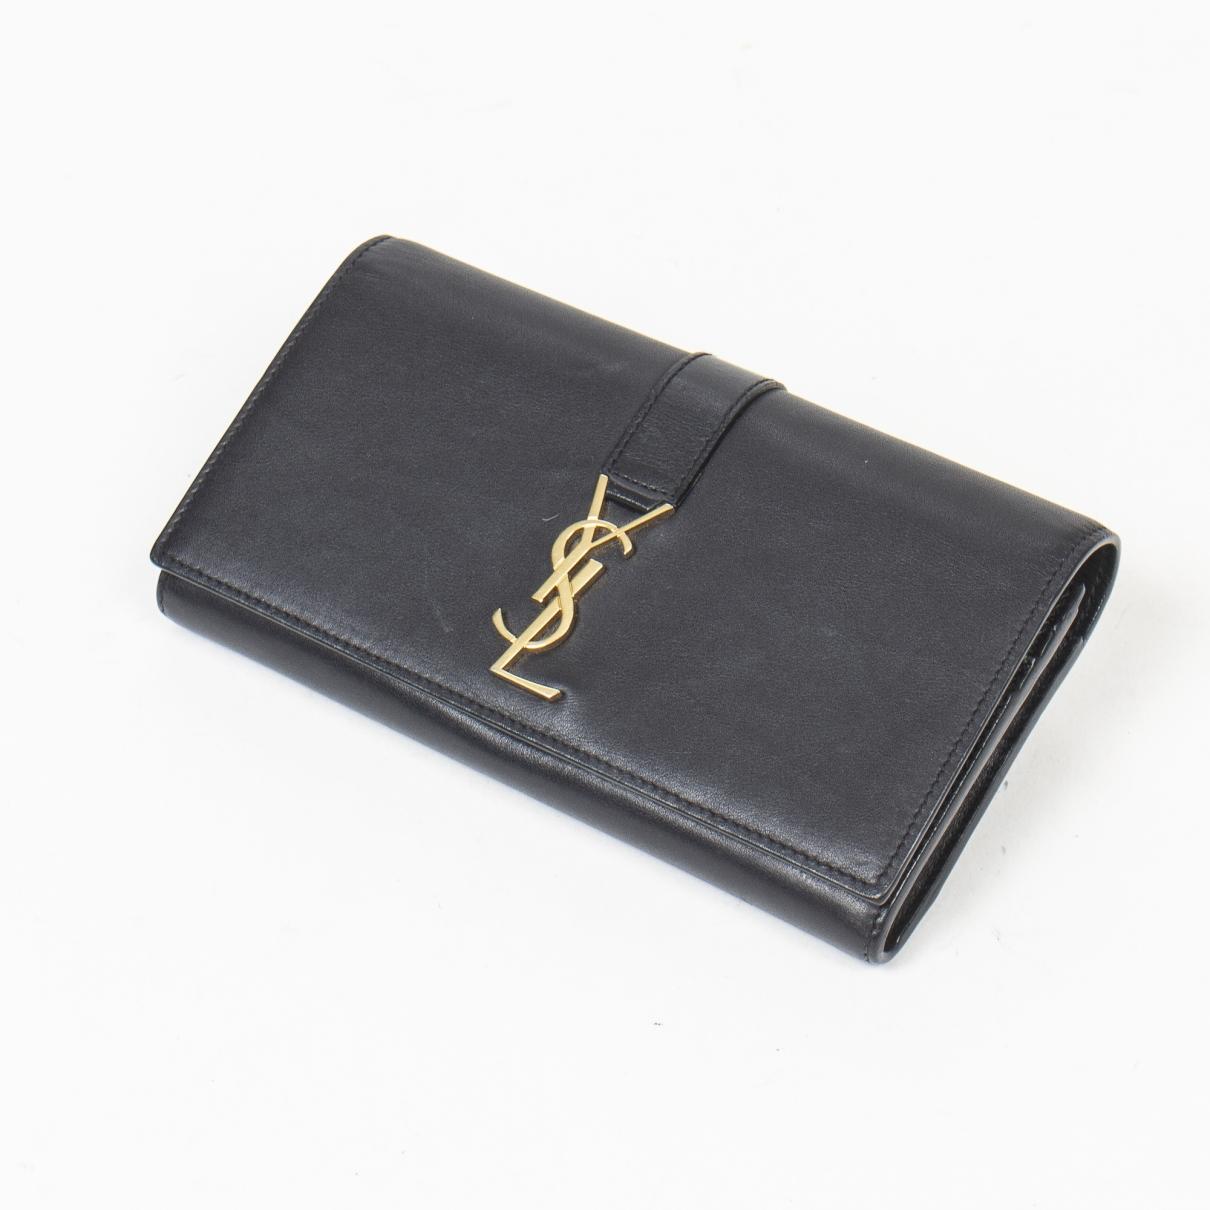 Yves Saint Laurent \N Portemonnaie in  Schwarz Leder